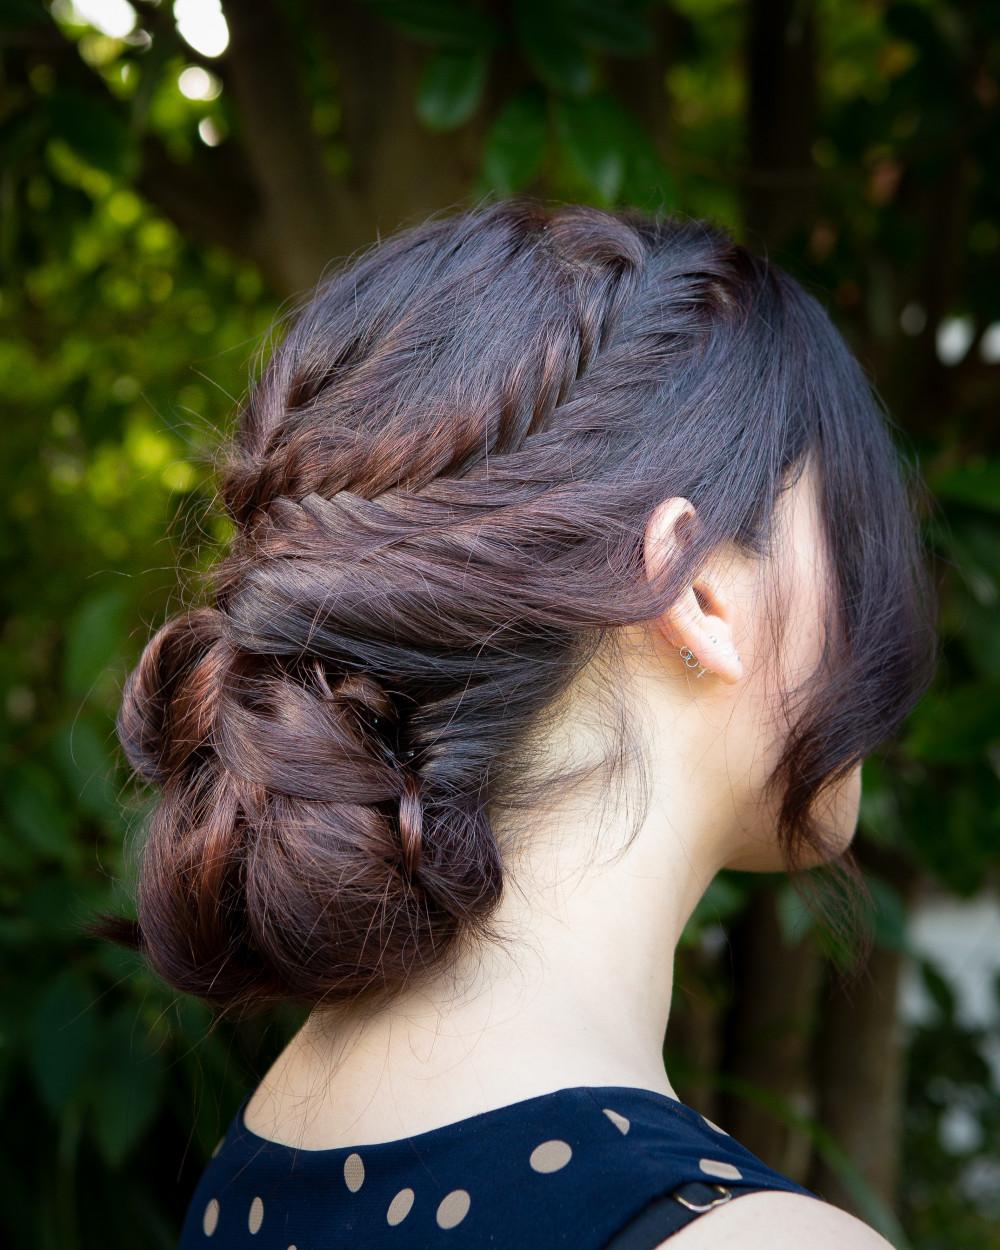 Bridal hair - Fishtail braid into low bun updo - Make Me Bridal Artist: Head Turners - Martine Turner. Photography by: Robert Bousfield. #bridesmaidhair #bridalhair #bridalhairstylist #lowbun #bridesmaidhair #weddingmakeupsussex #plaitupdo #lowupdo #braidedupdo #brunette #sussexhairstylist #bohoupdo